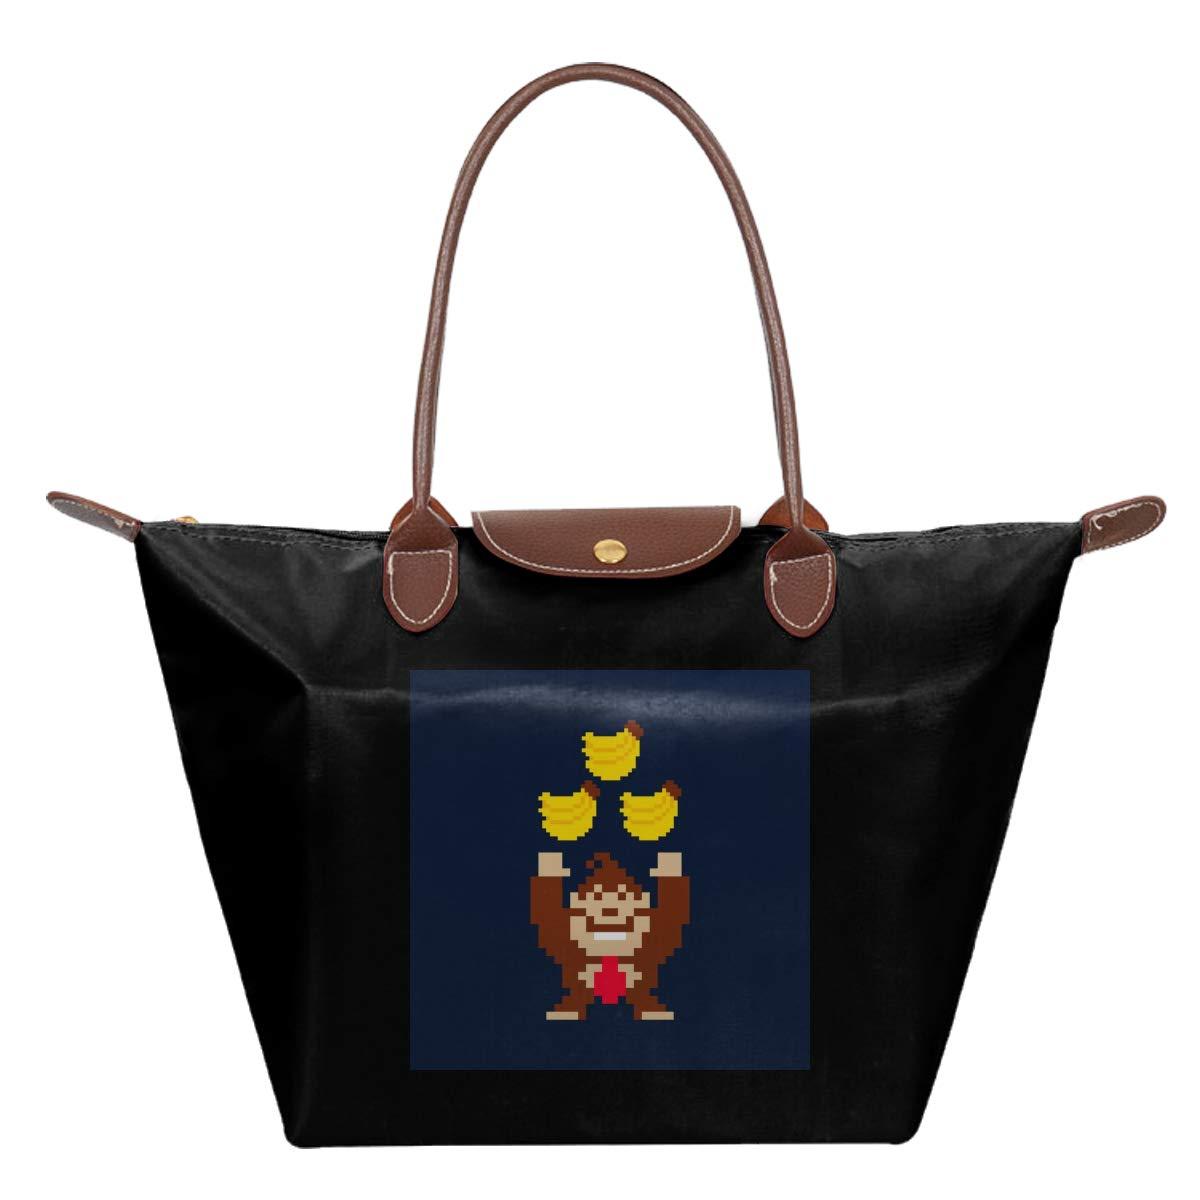 Donkey Kong Tribananas Waterproof Leather Folded Messenger Nylon Bag Travel Tote Hopping Folding School Handbags